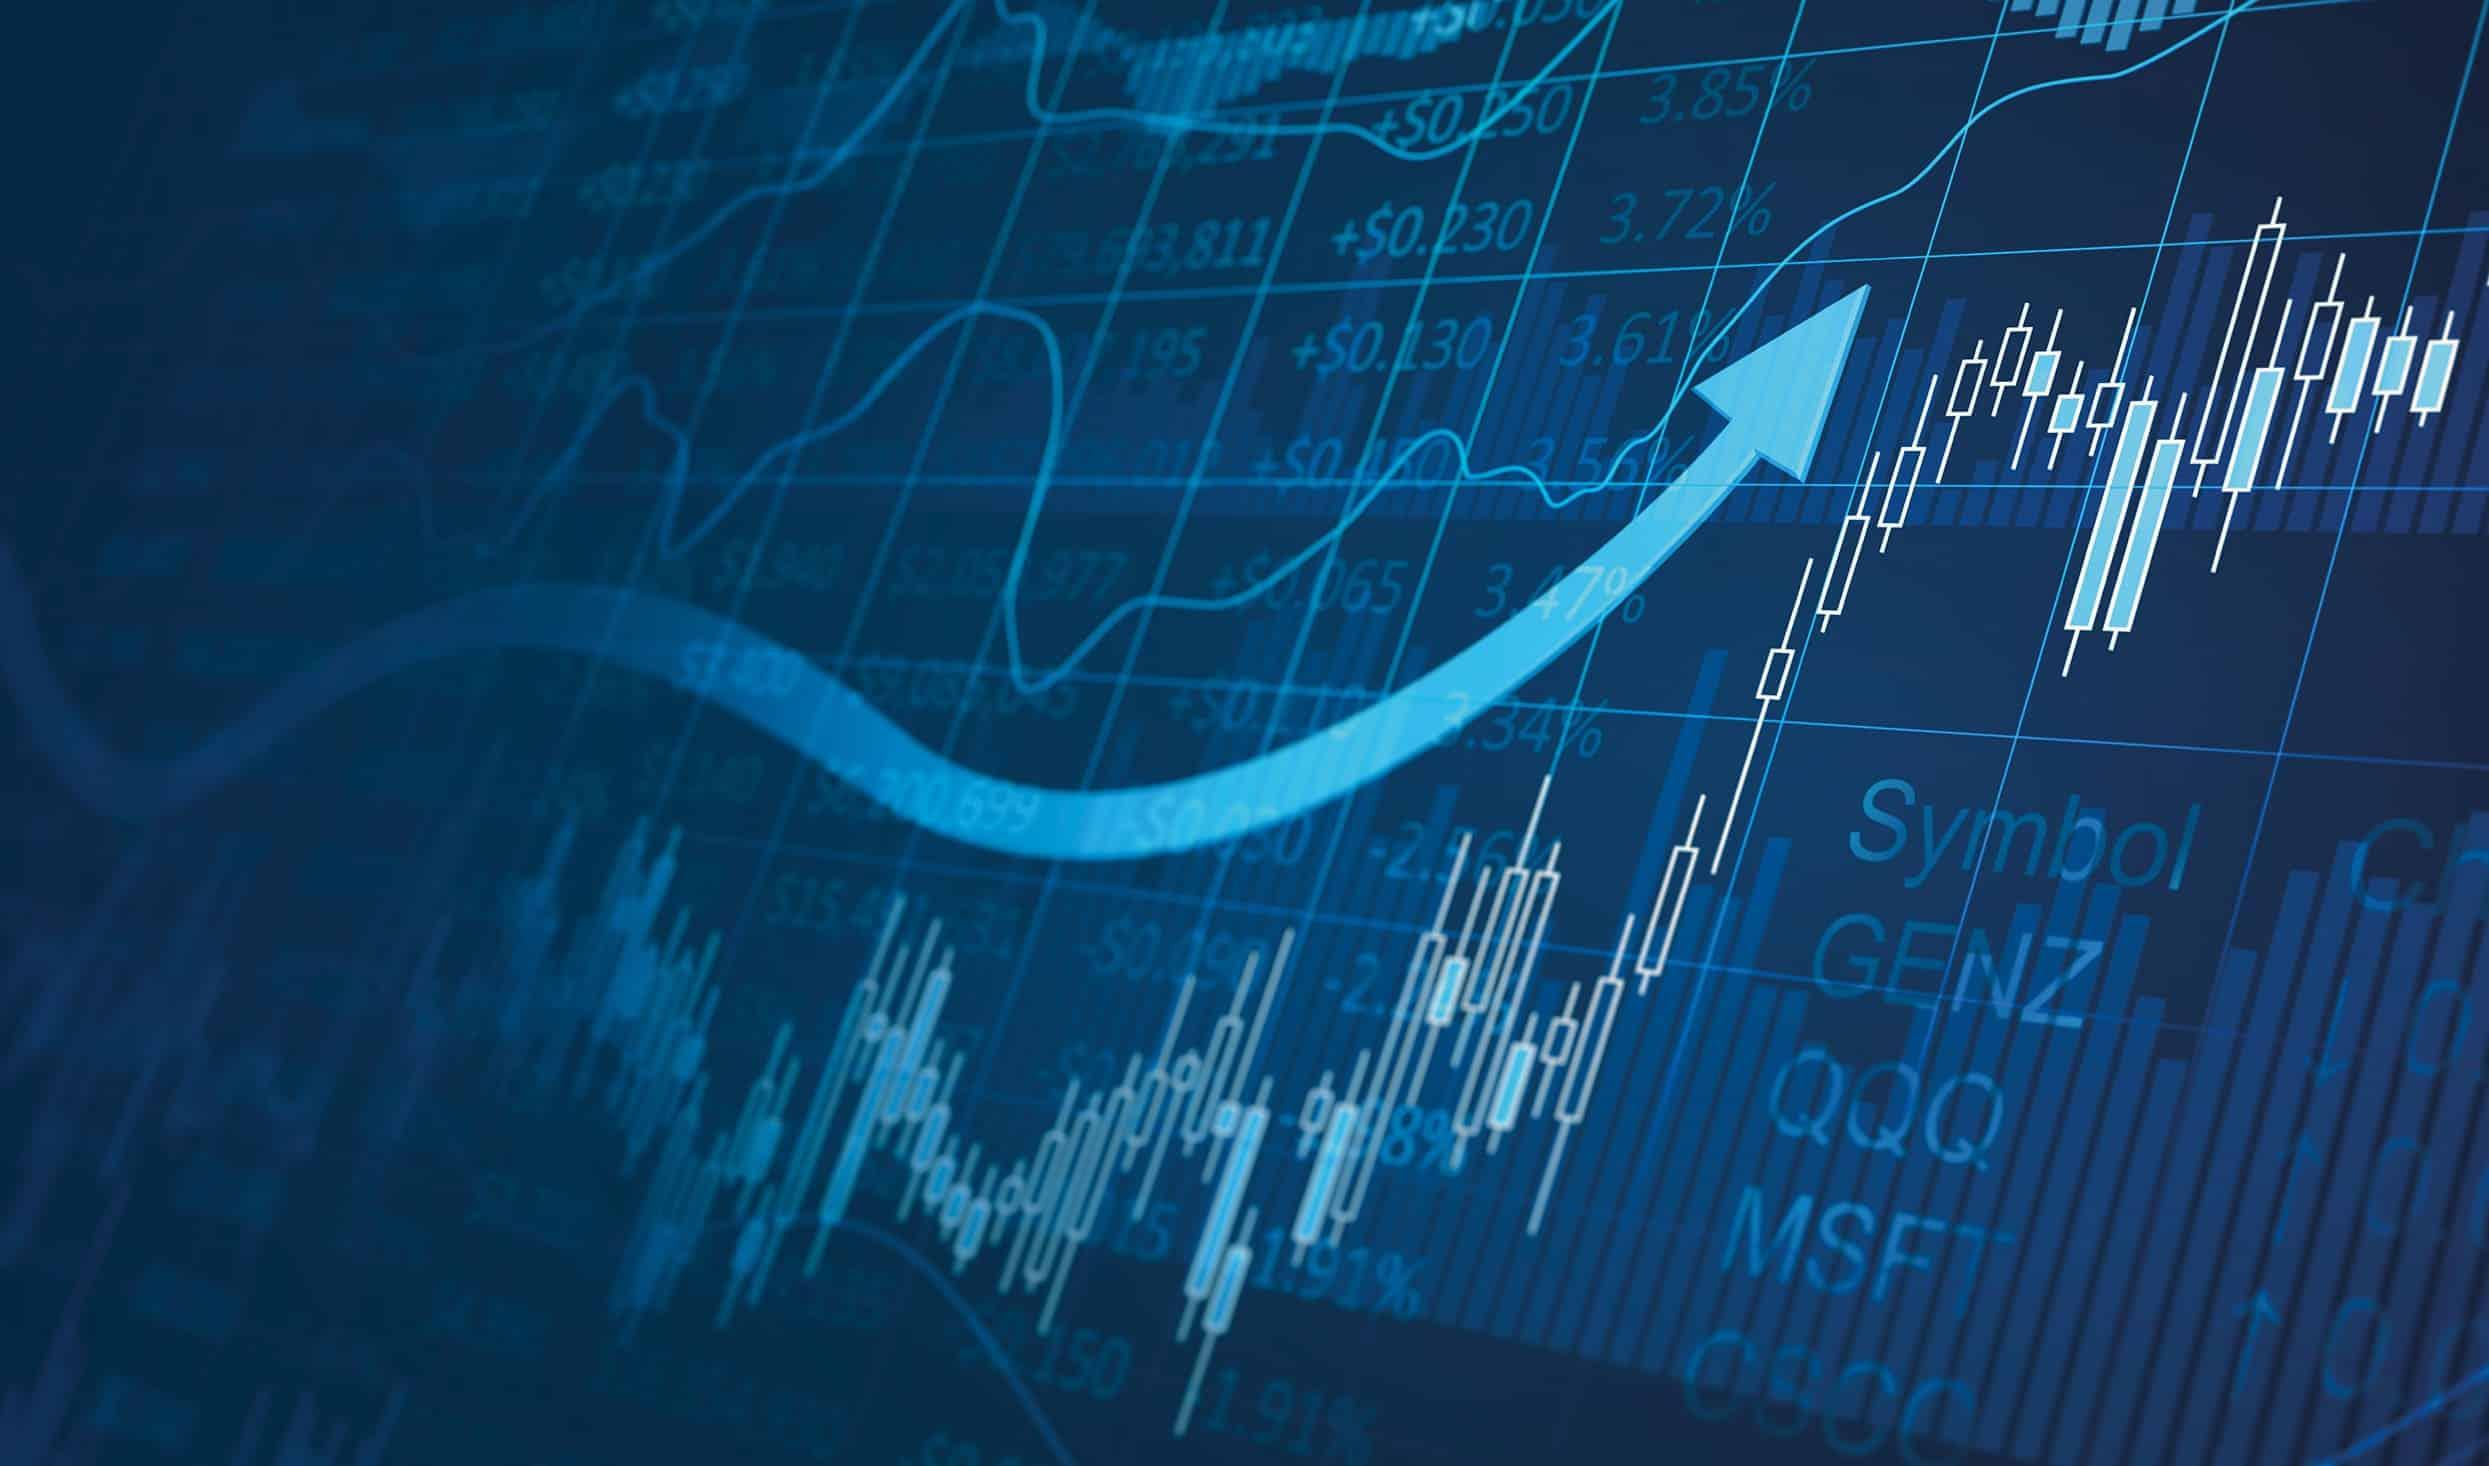 UN Predicts 3 Percent Global Economic Growth In 2019